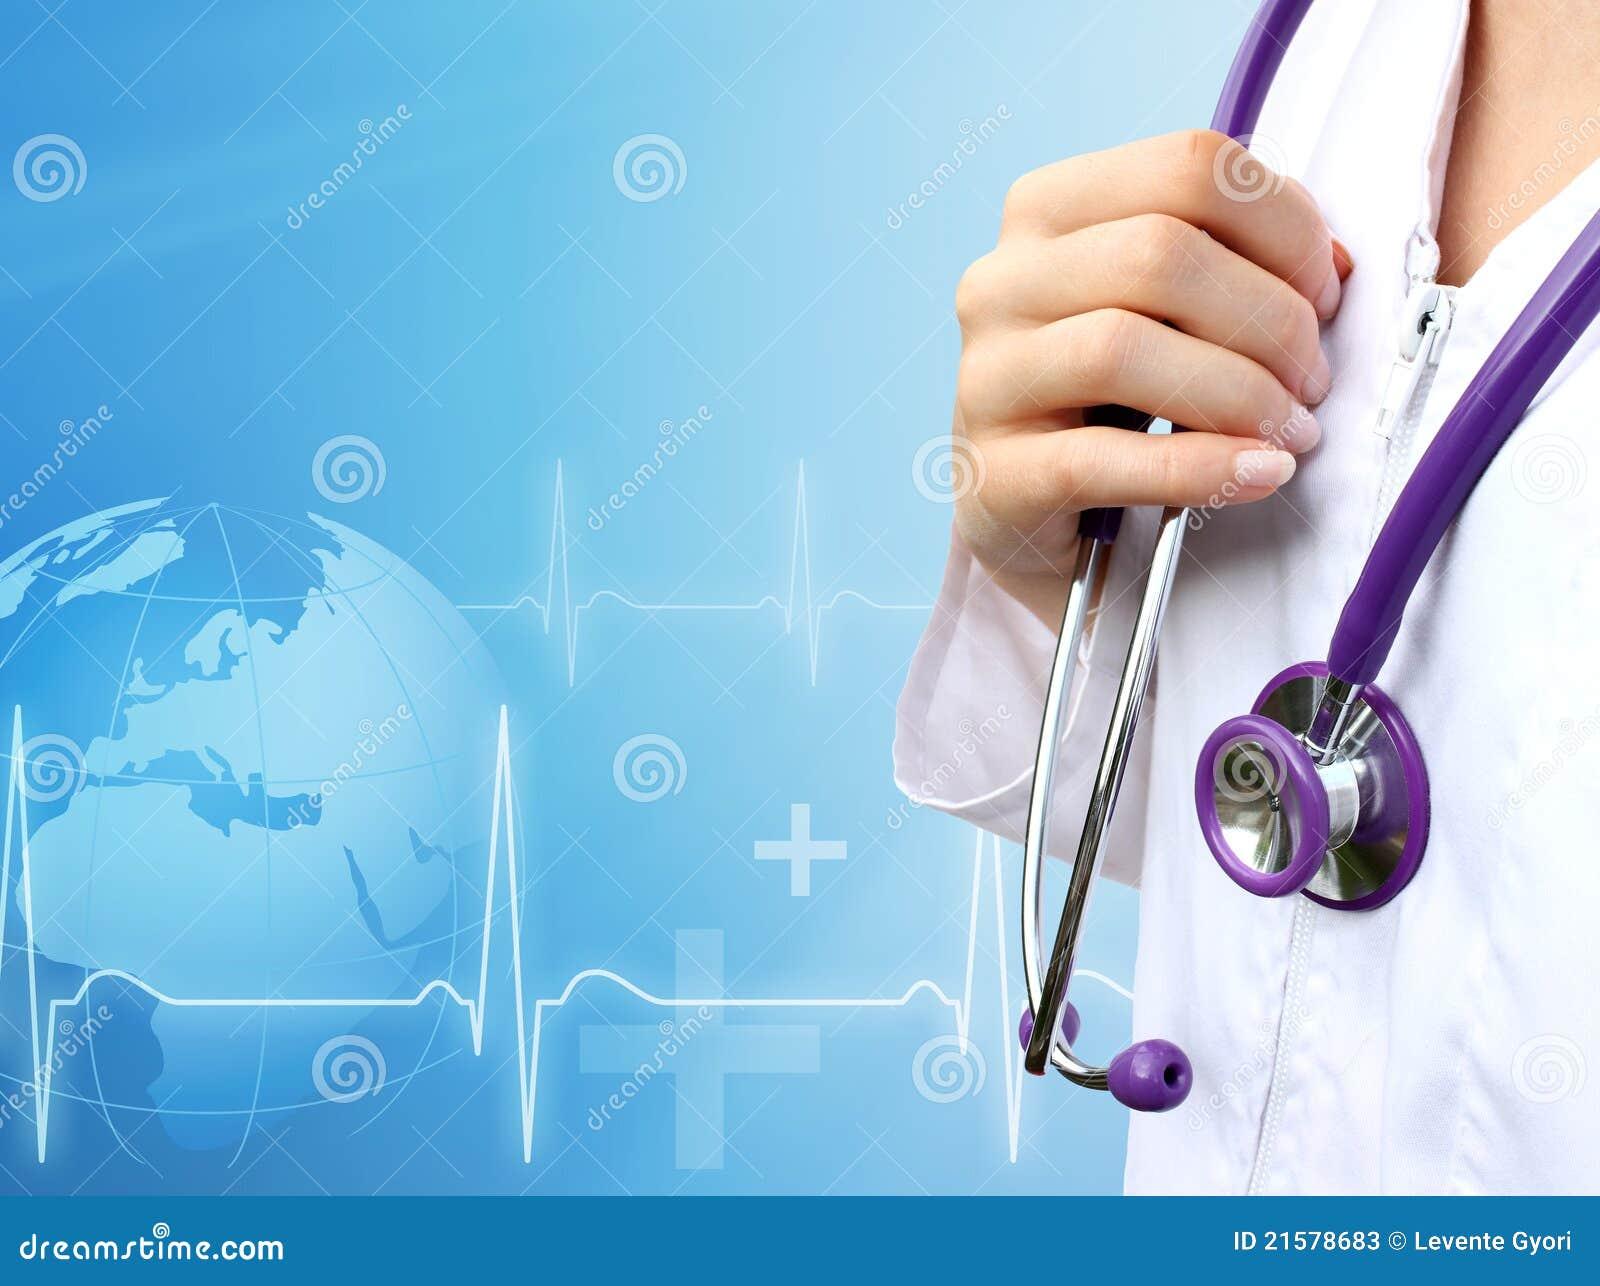 Nurse With Medical Blue Background Stock Image